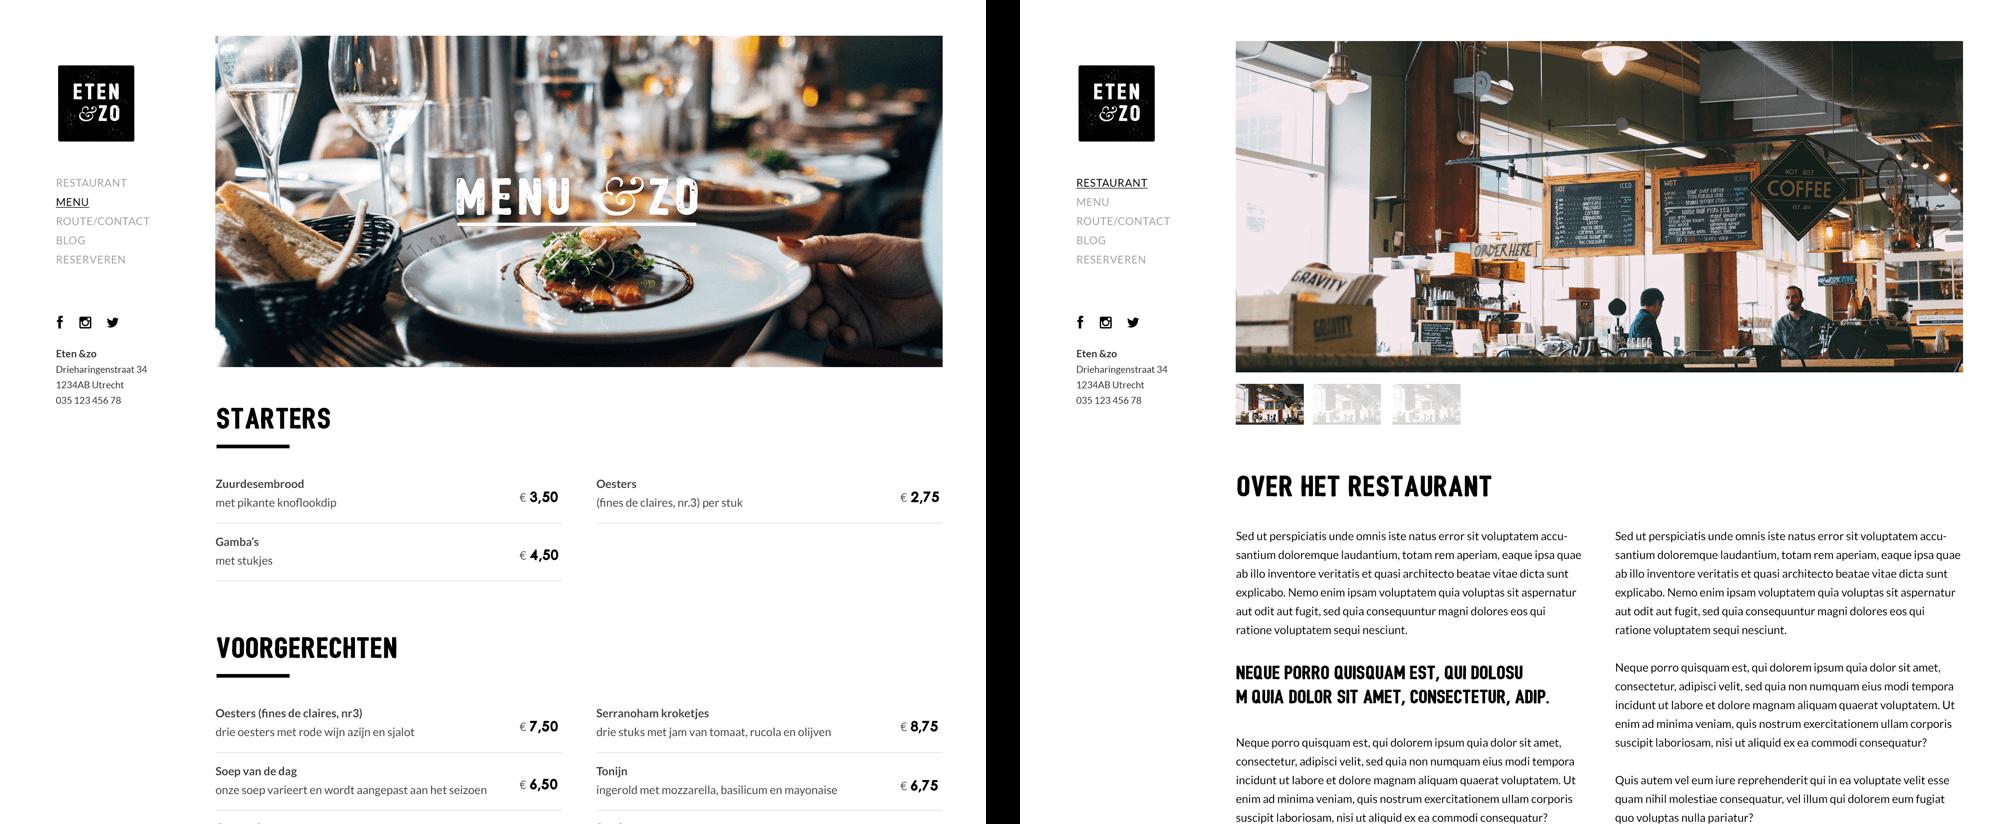 etenenzo_menu